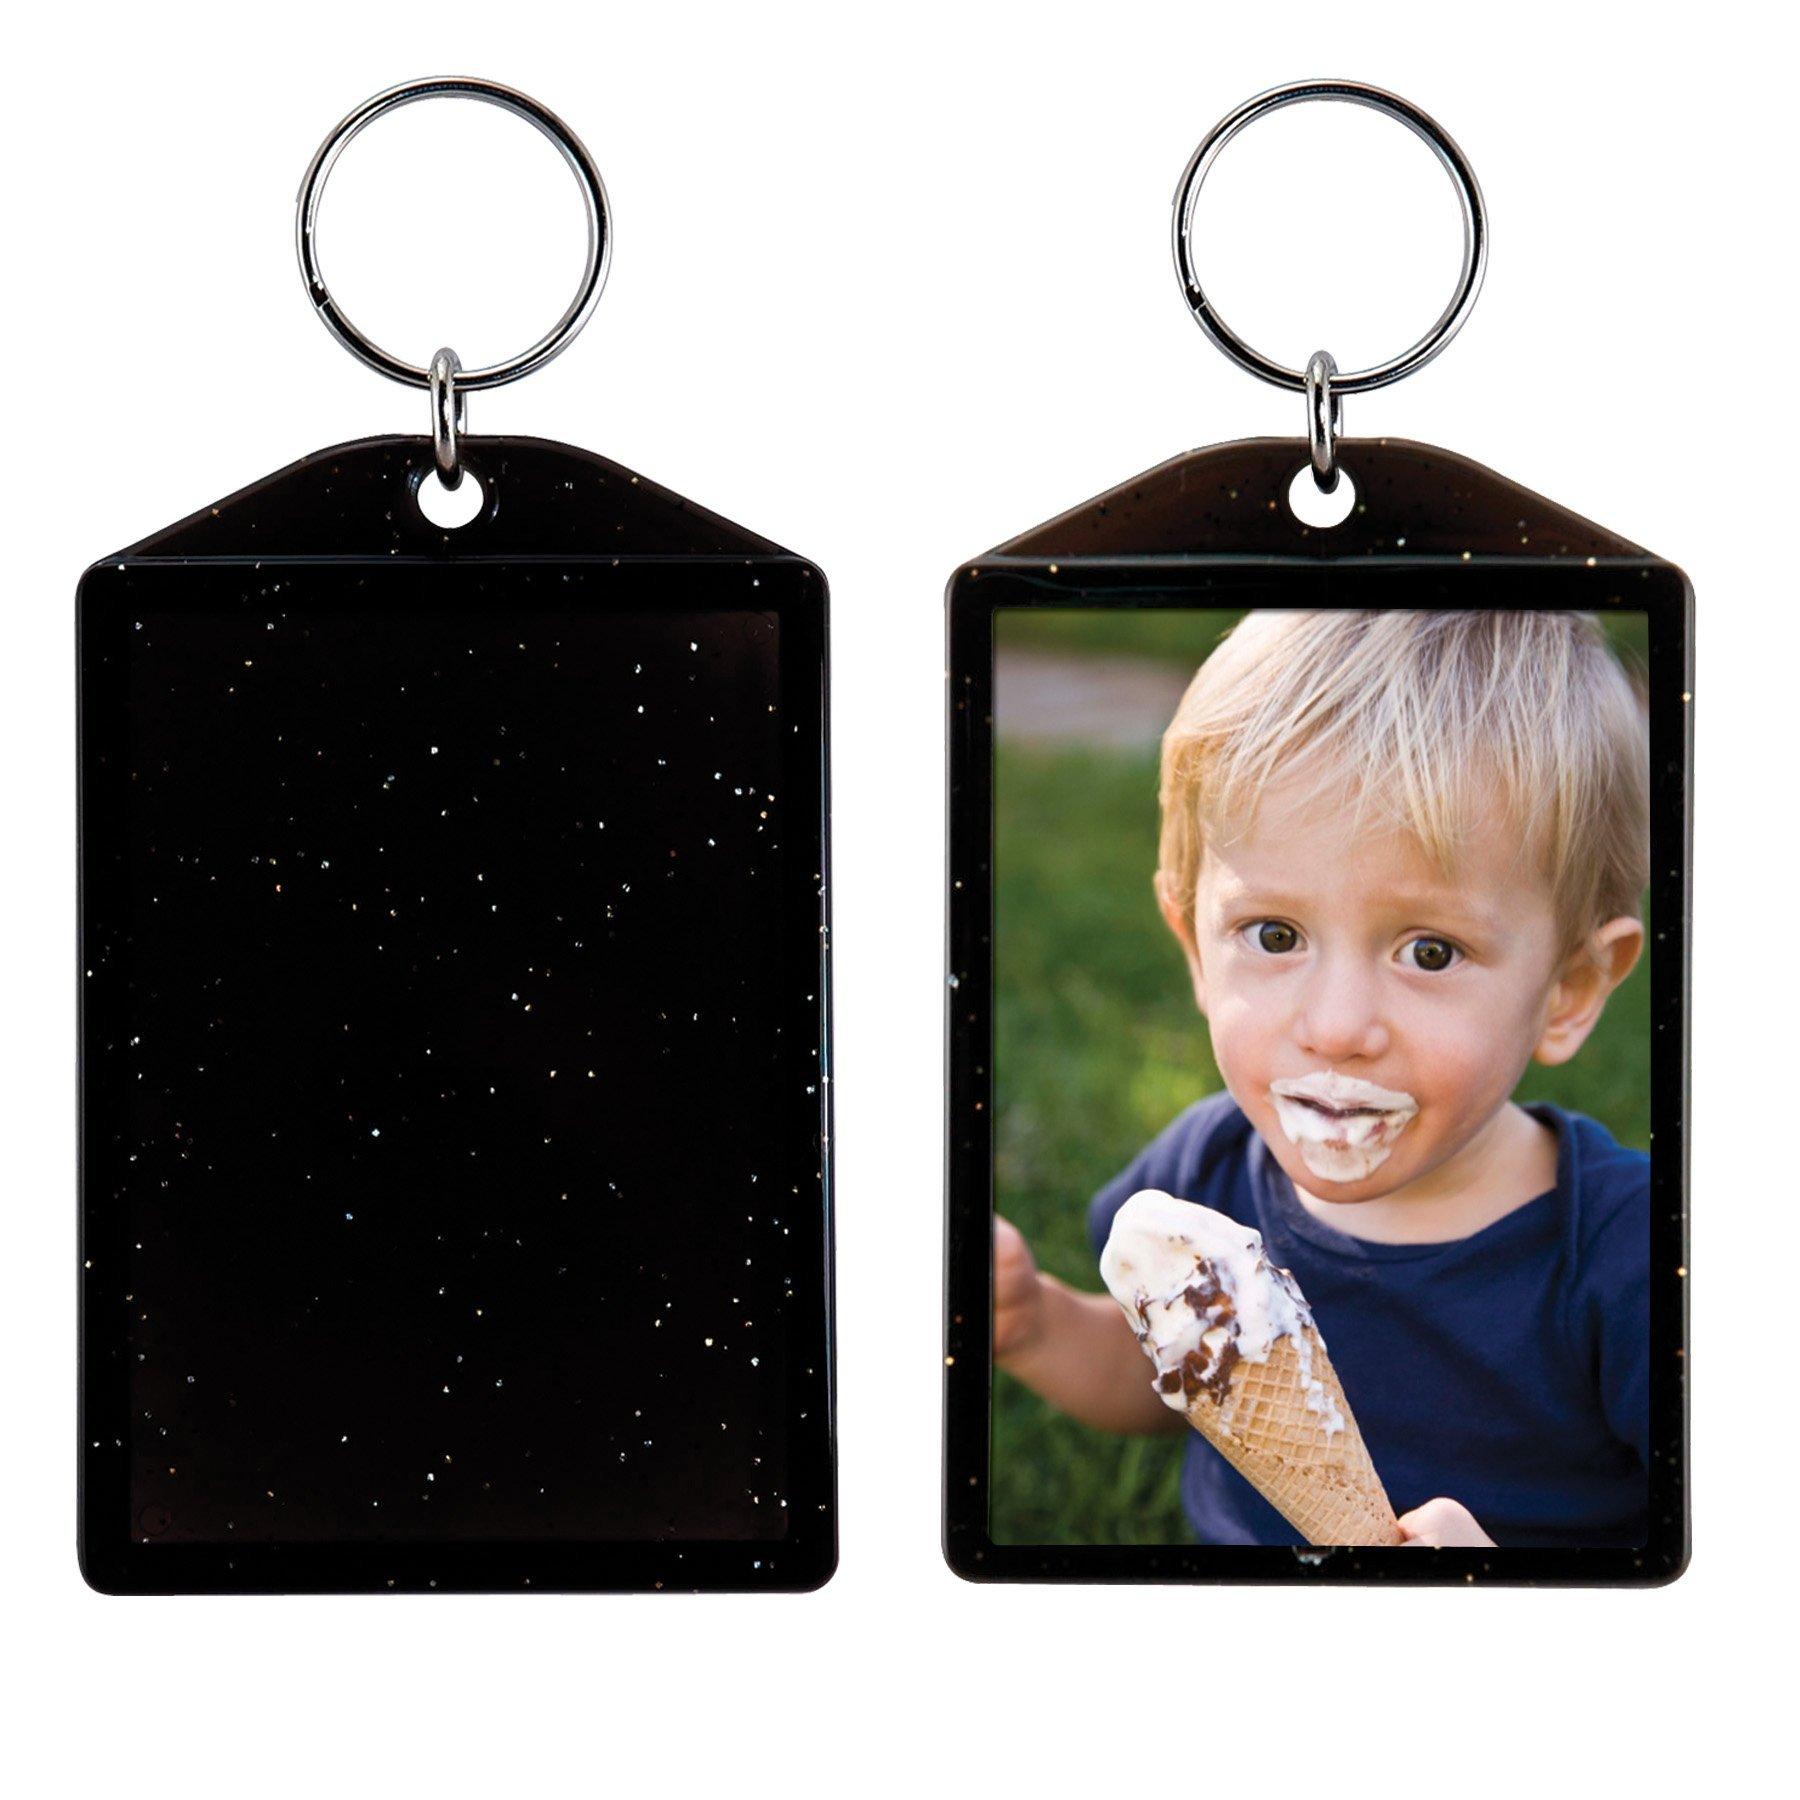 Translucent Sparkle Photo Keychain - 24 Pack (Black)